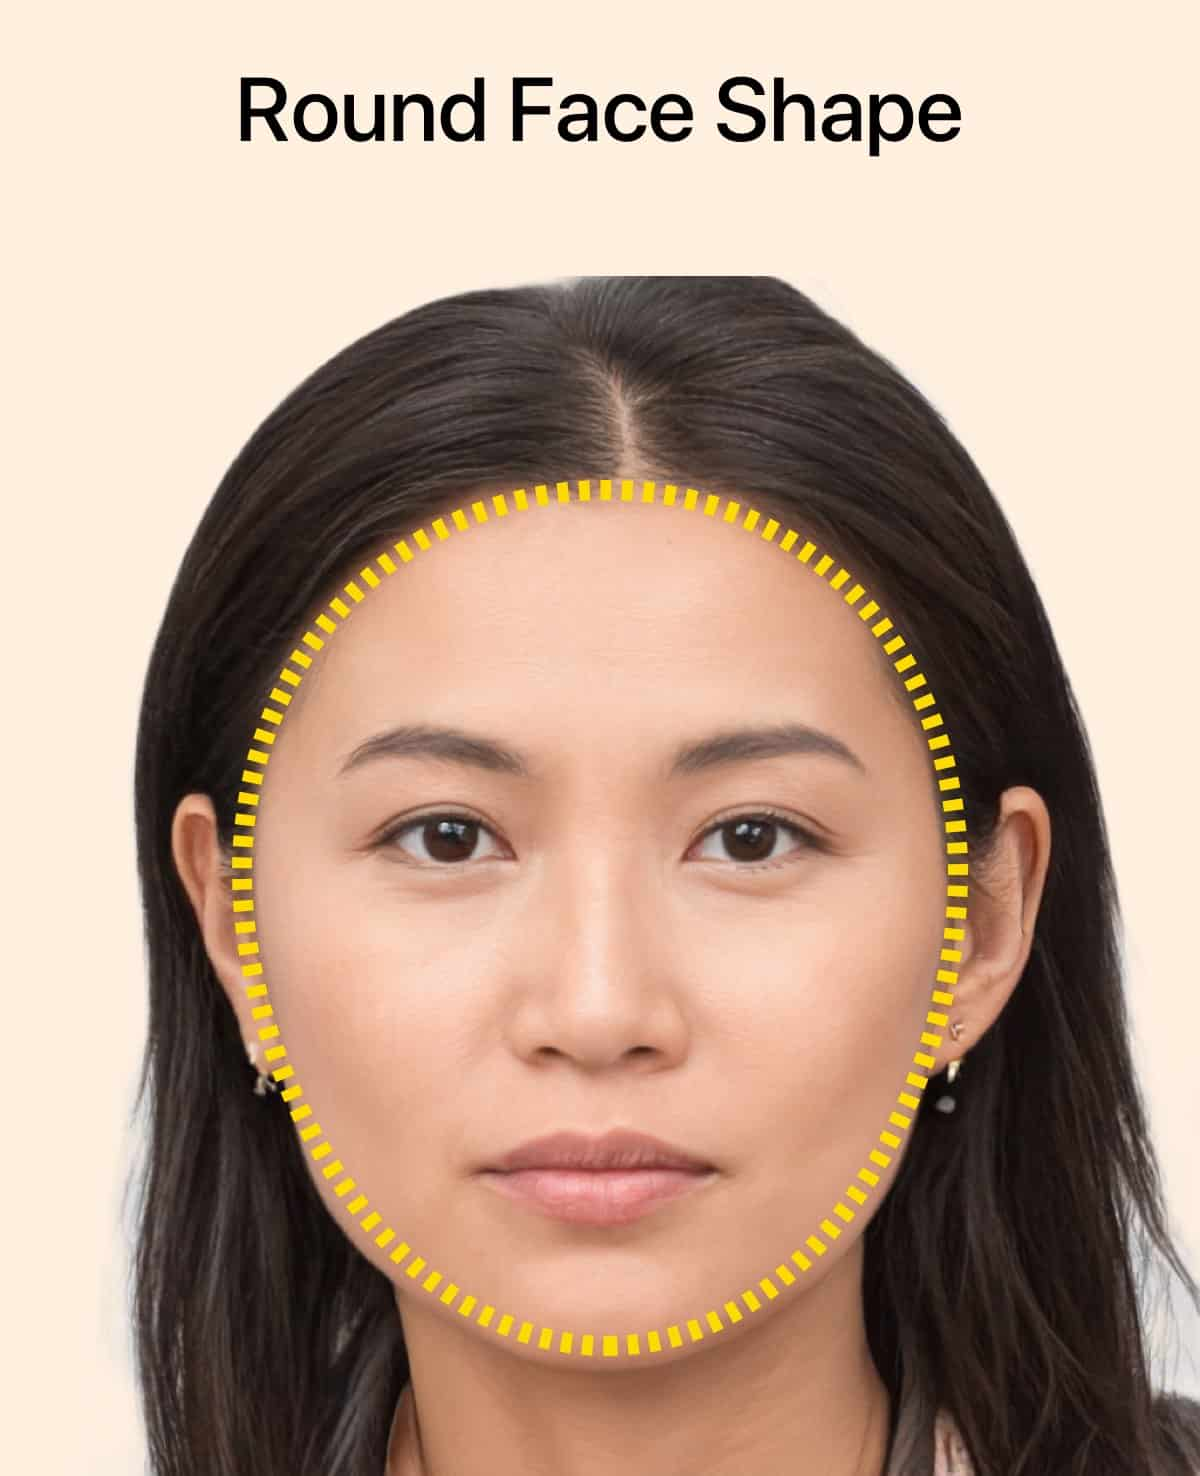 La forme du visage rond